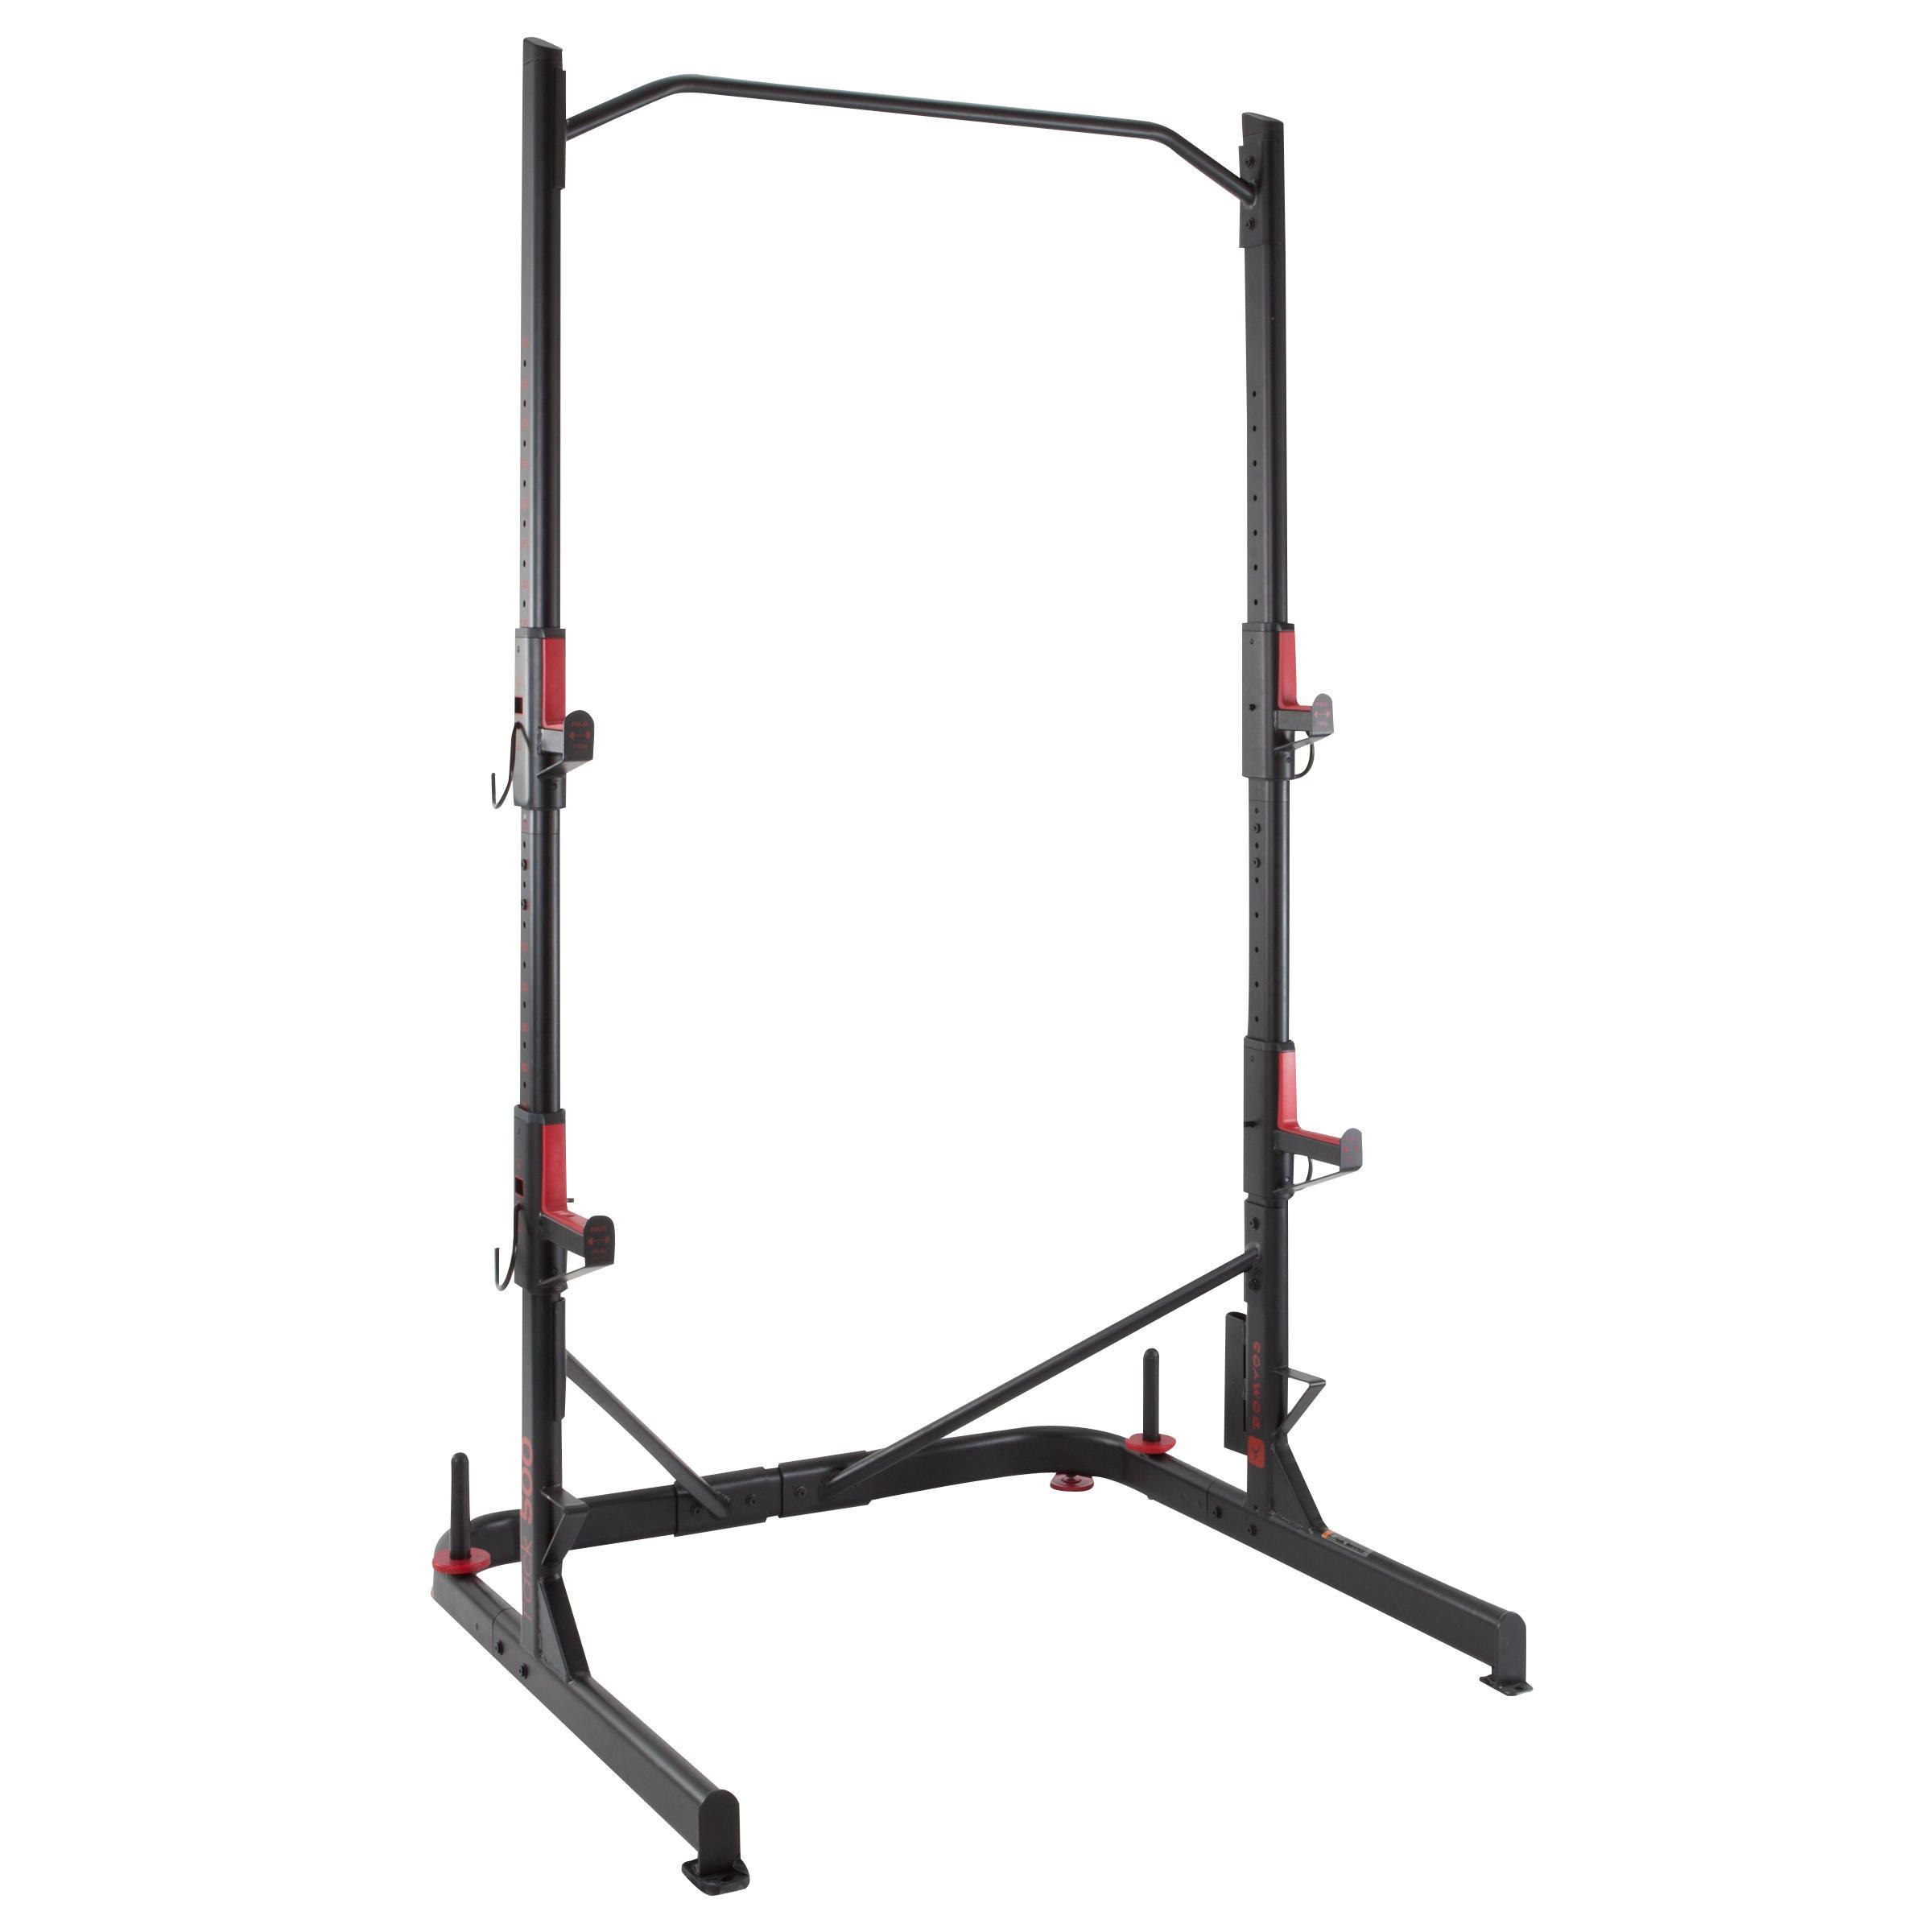 Suport Bodybuilding Rack 500 imagine